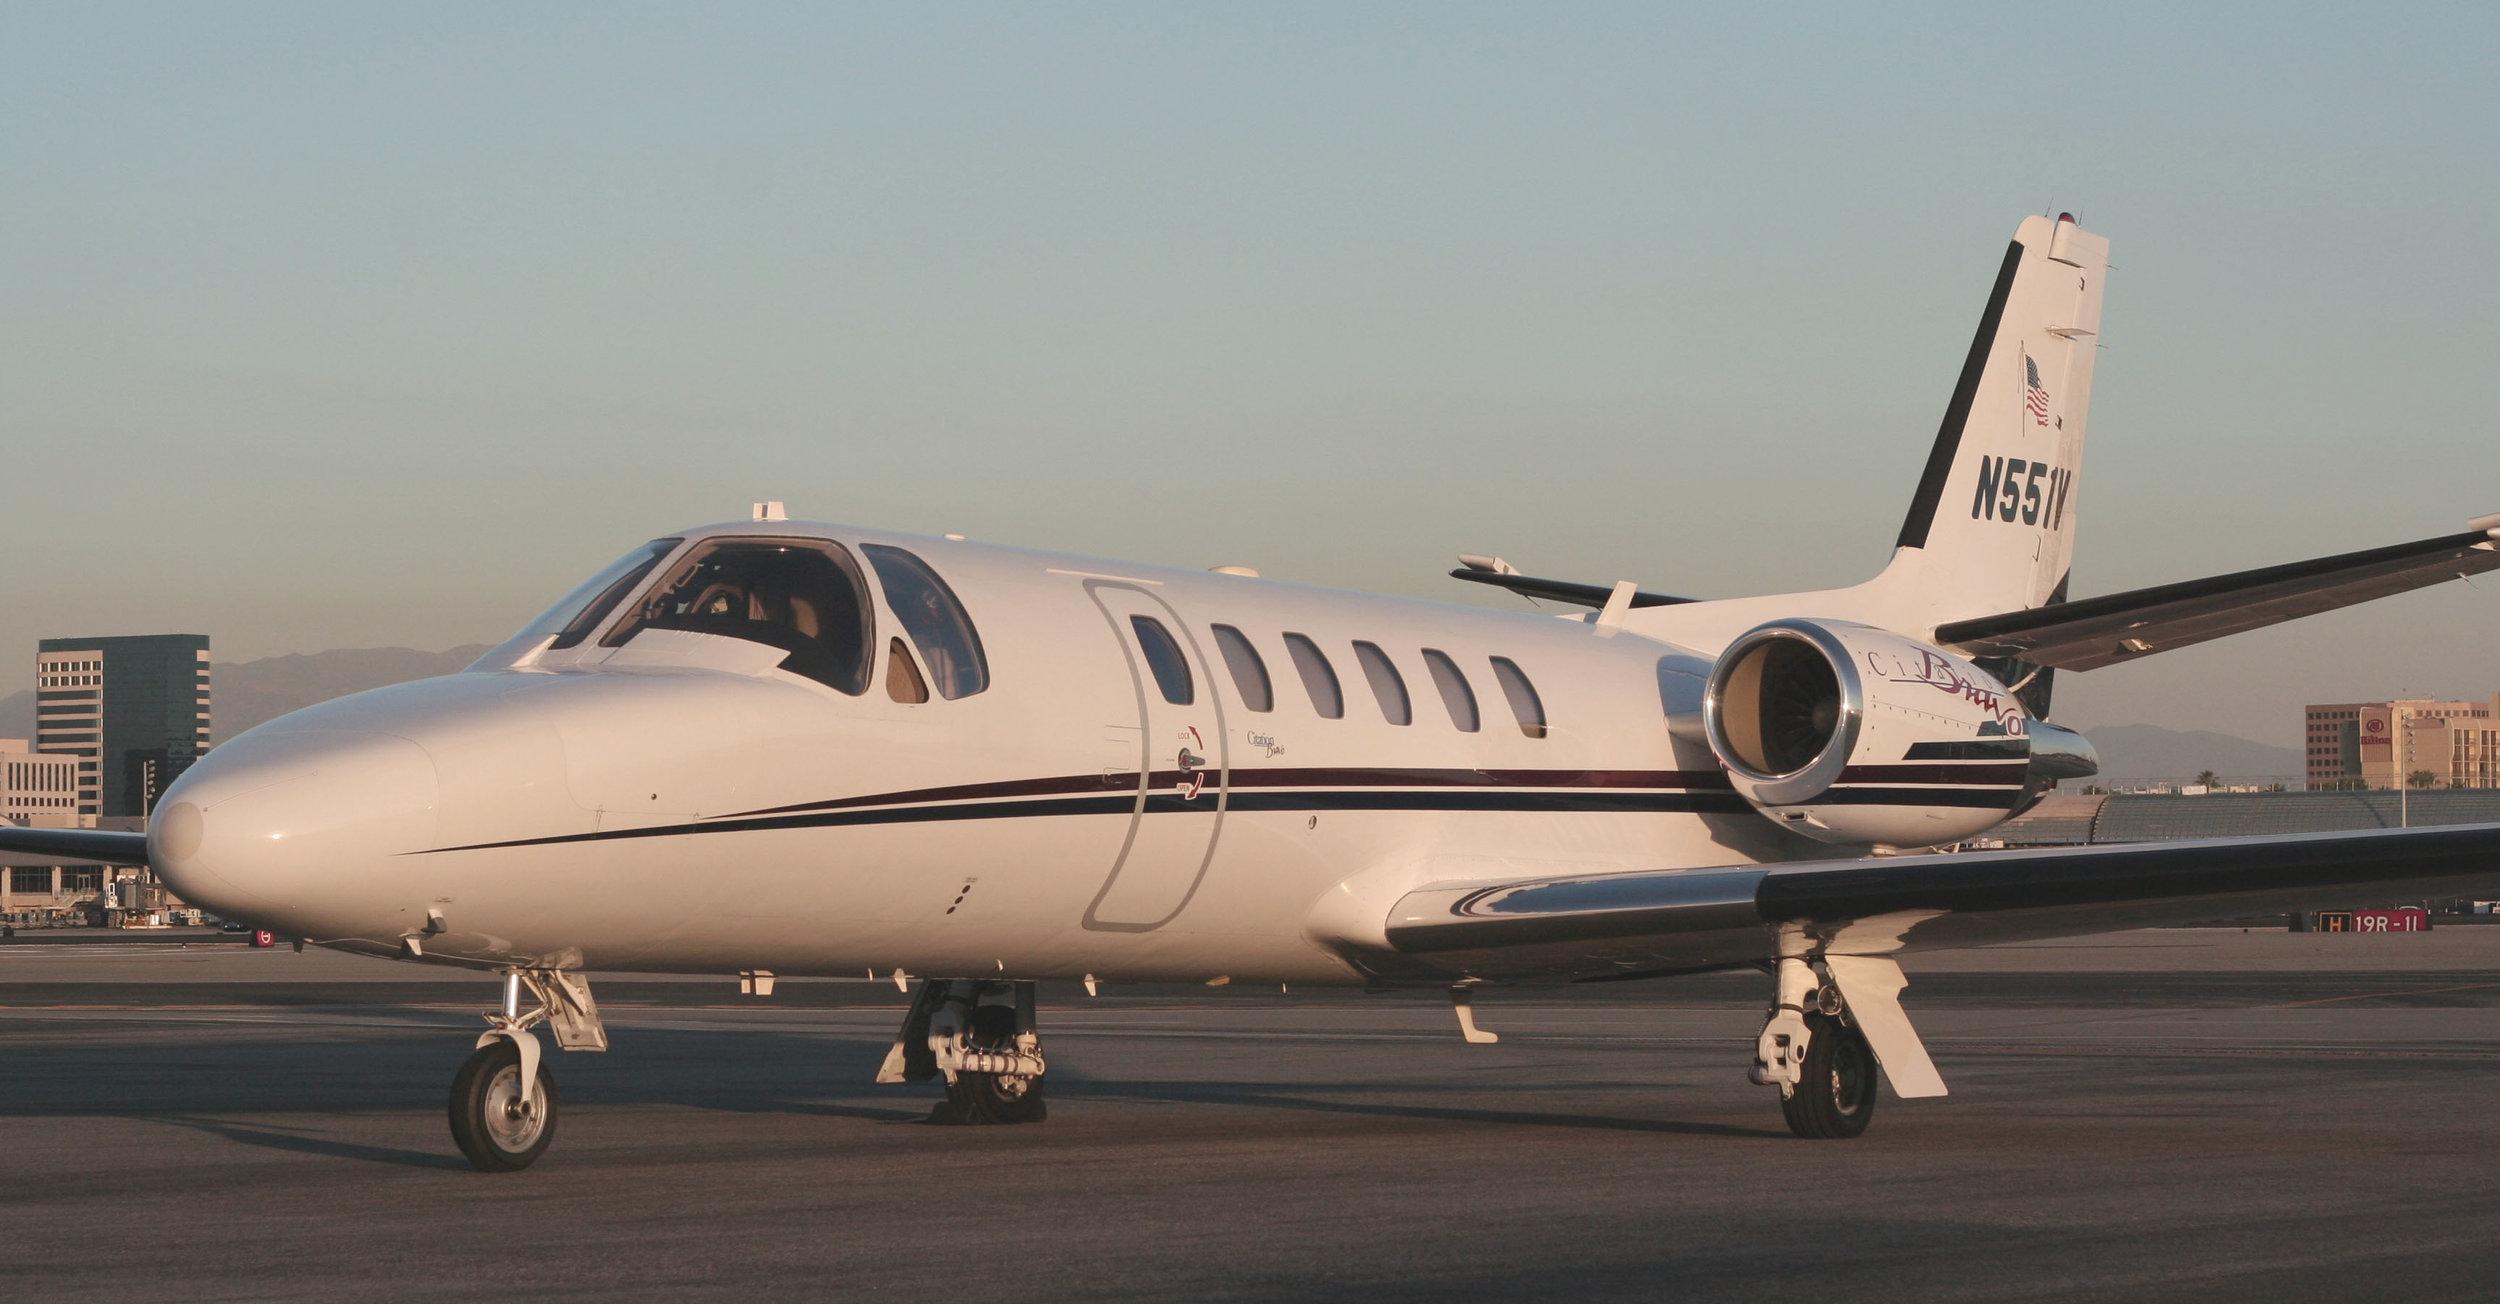 CITATION_BRAVO_Legacy_Aviation_Private_Jet_NetJets_jet_charter_TEB_VNY_MIA_PBI_FRG_SFO_FLL_FXE_BED copy.jpg